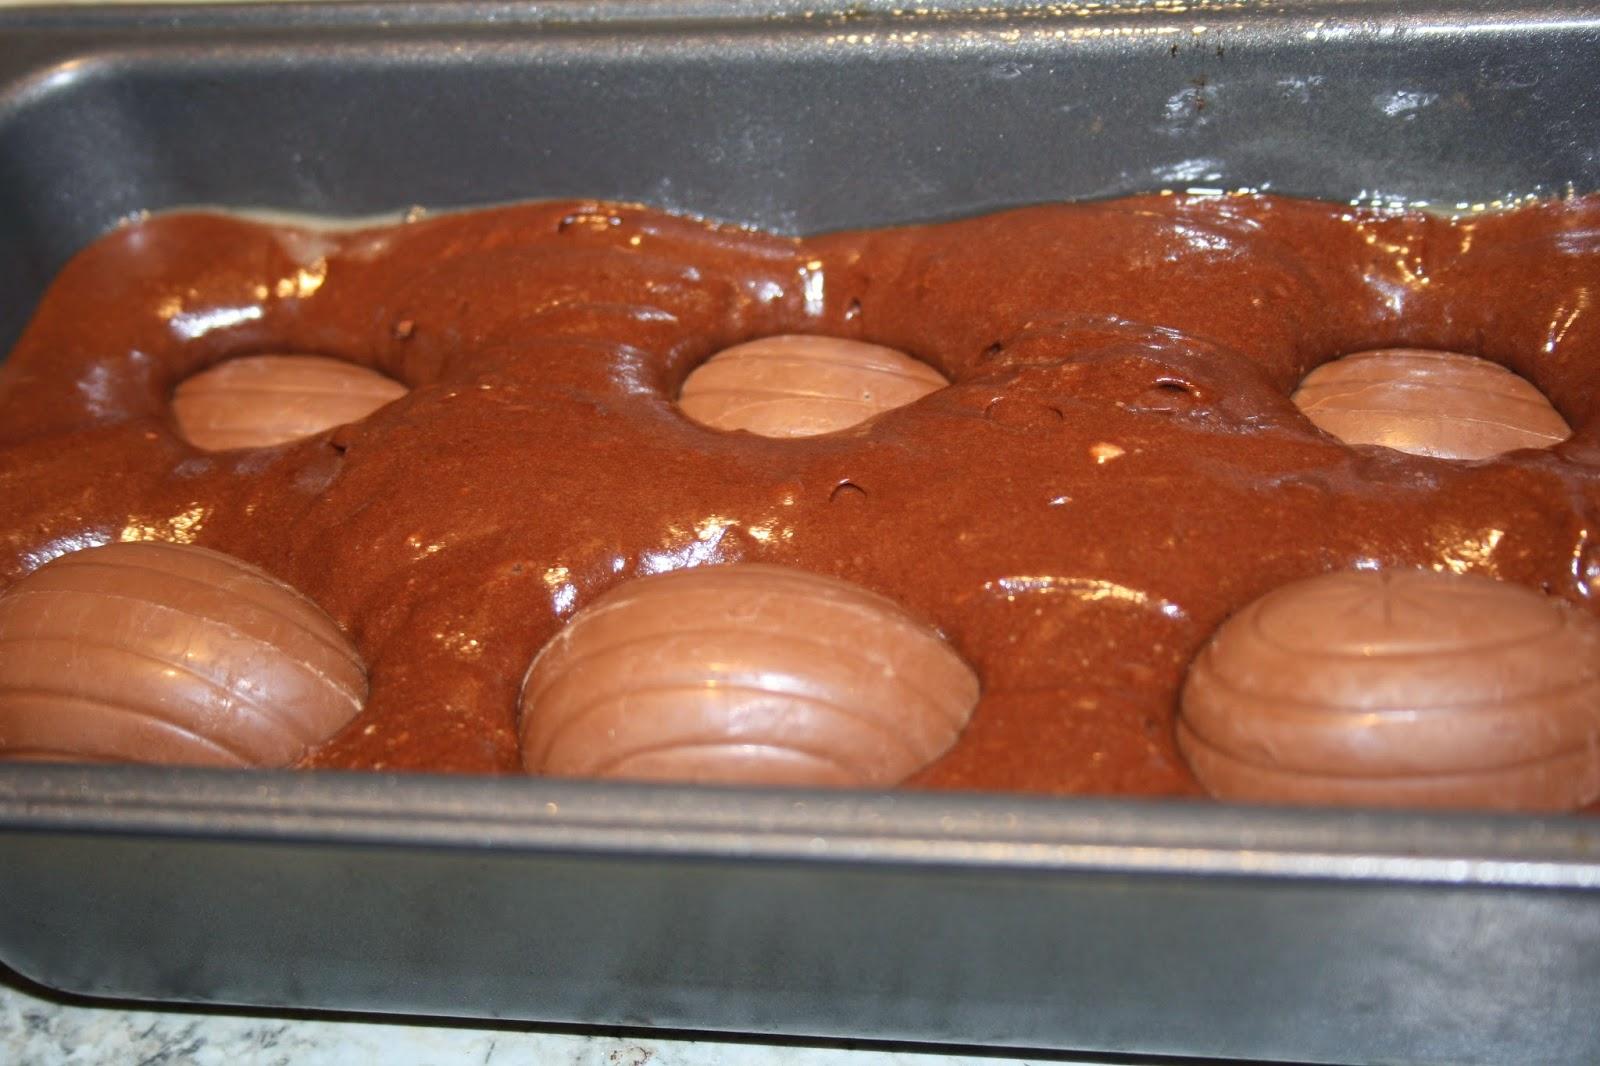 Cadburys creme egg cake